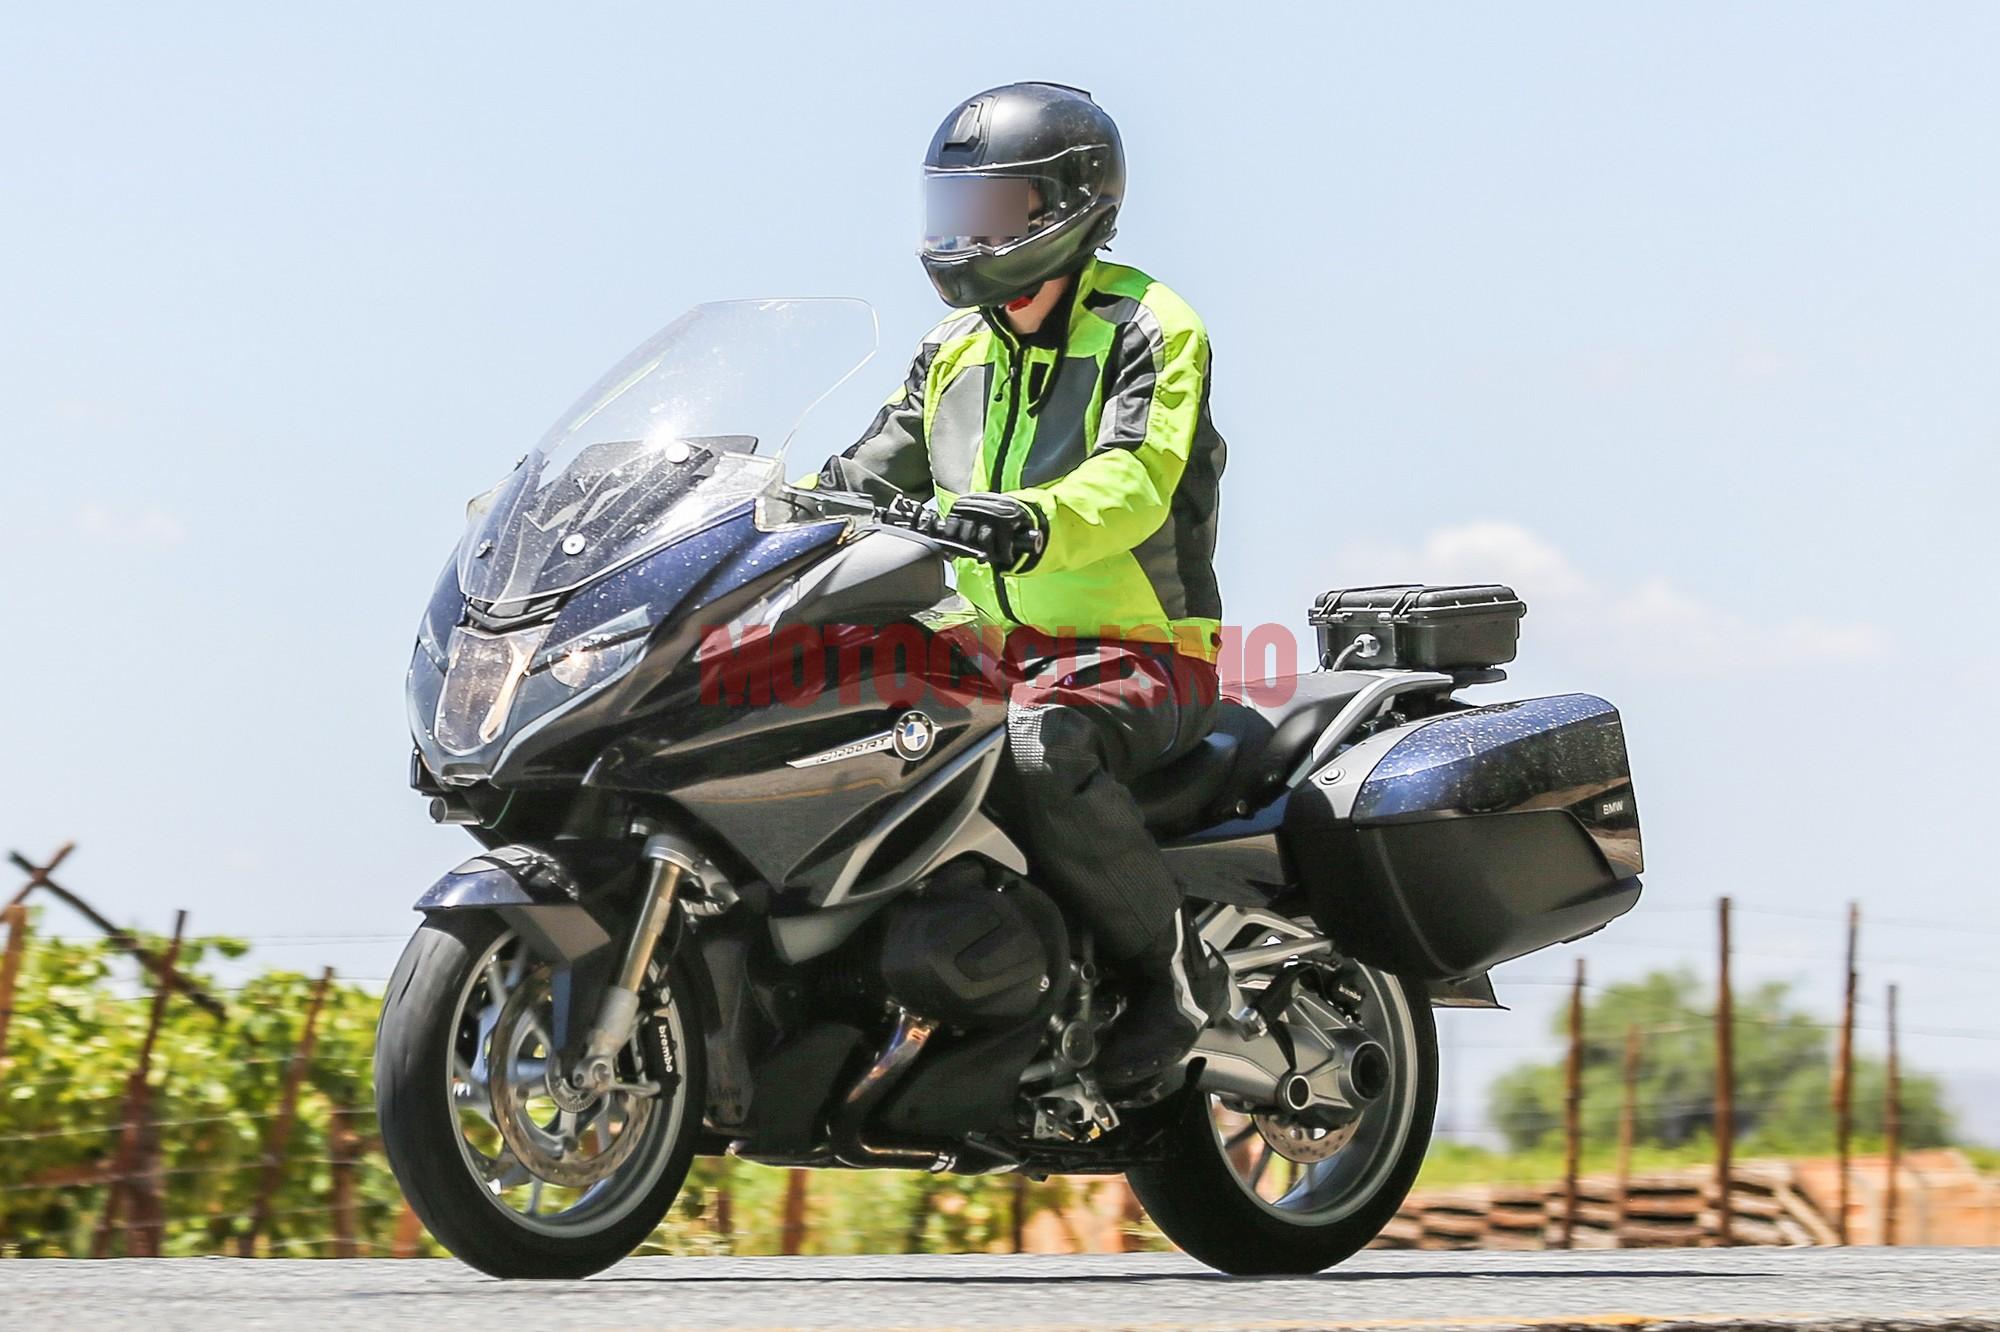 2019 1250RT Test Mule Headlight...-bmw-r-1250-rt-riders.drivemag.com_.jpg